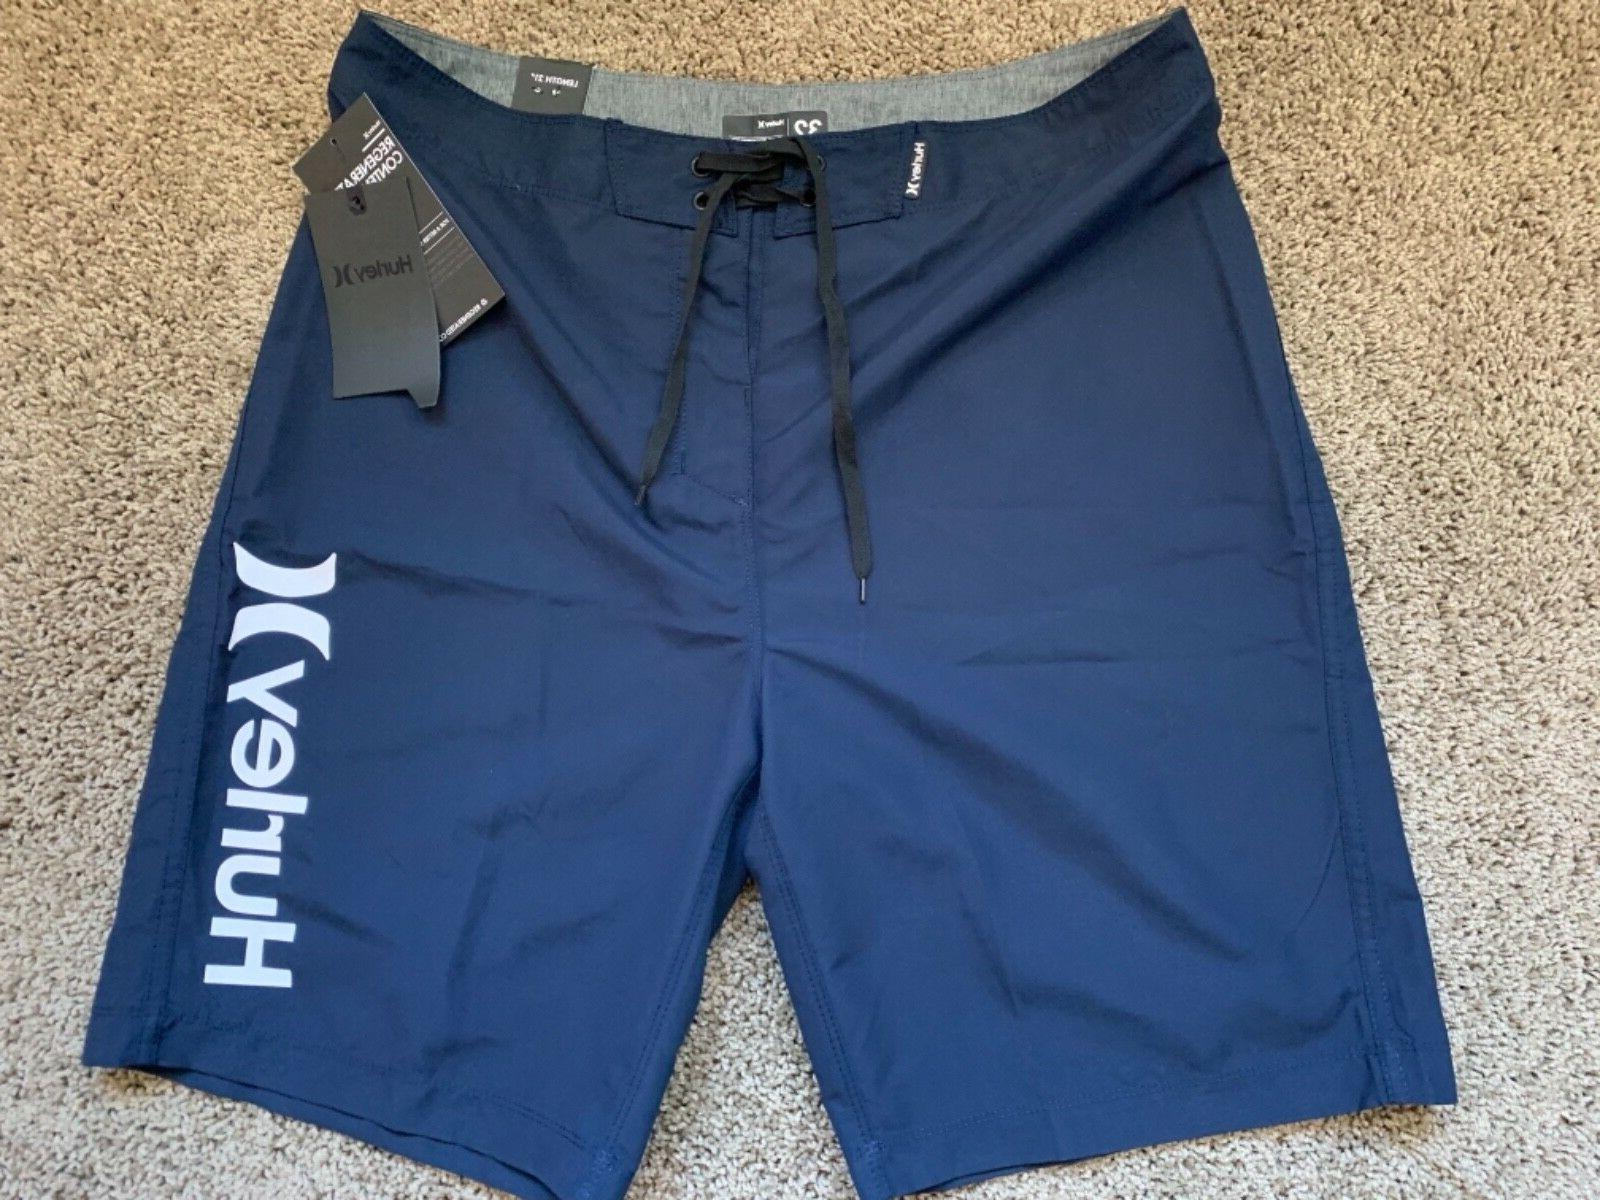 brand new navy blue mens board shorts